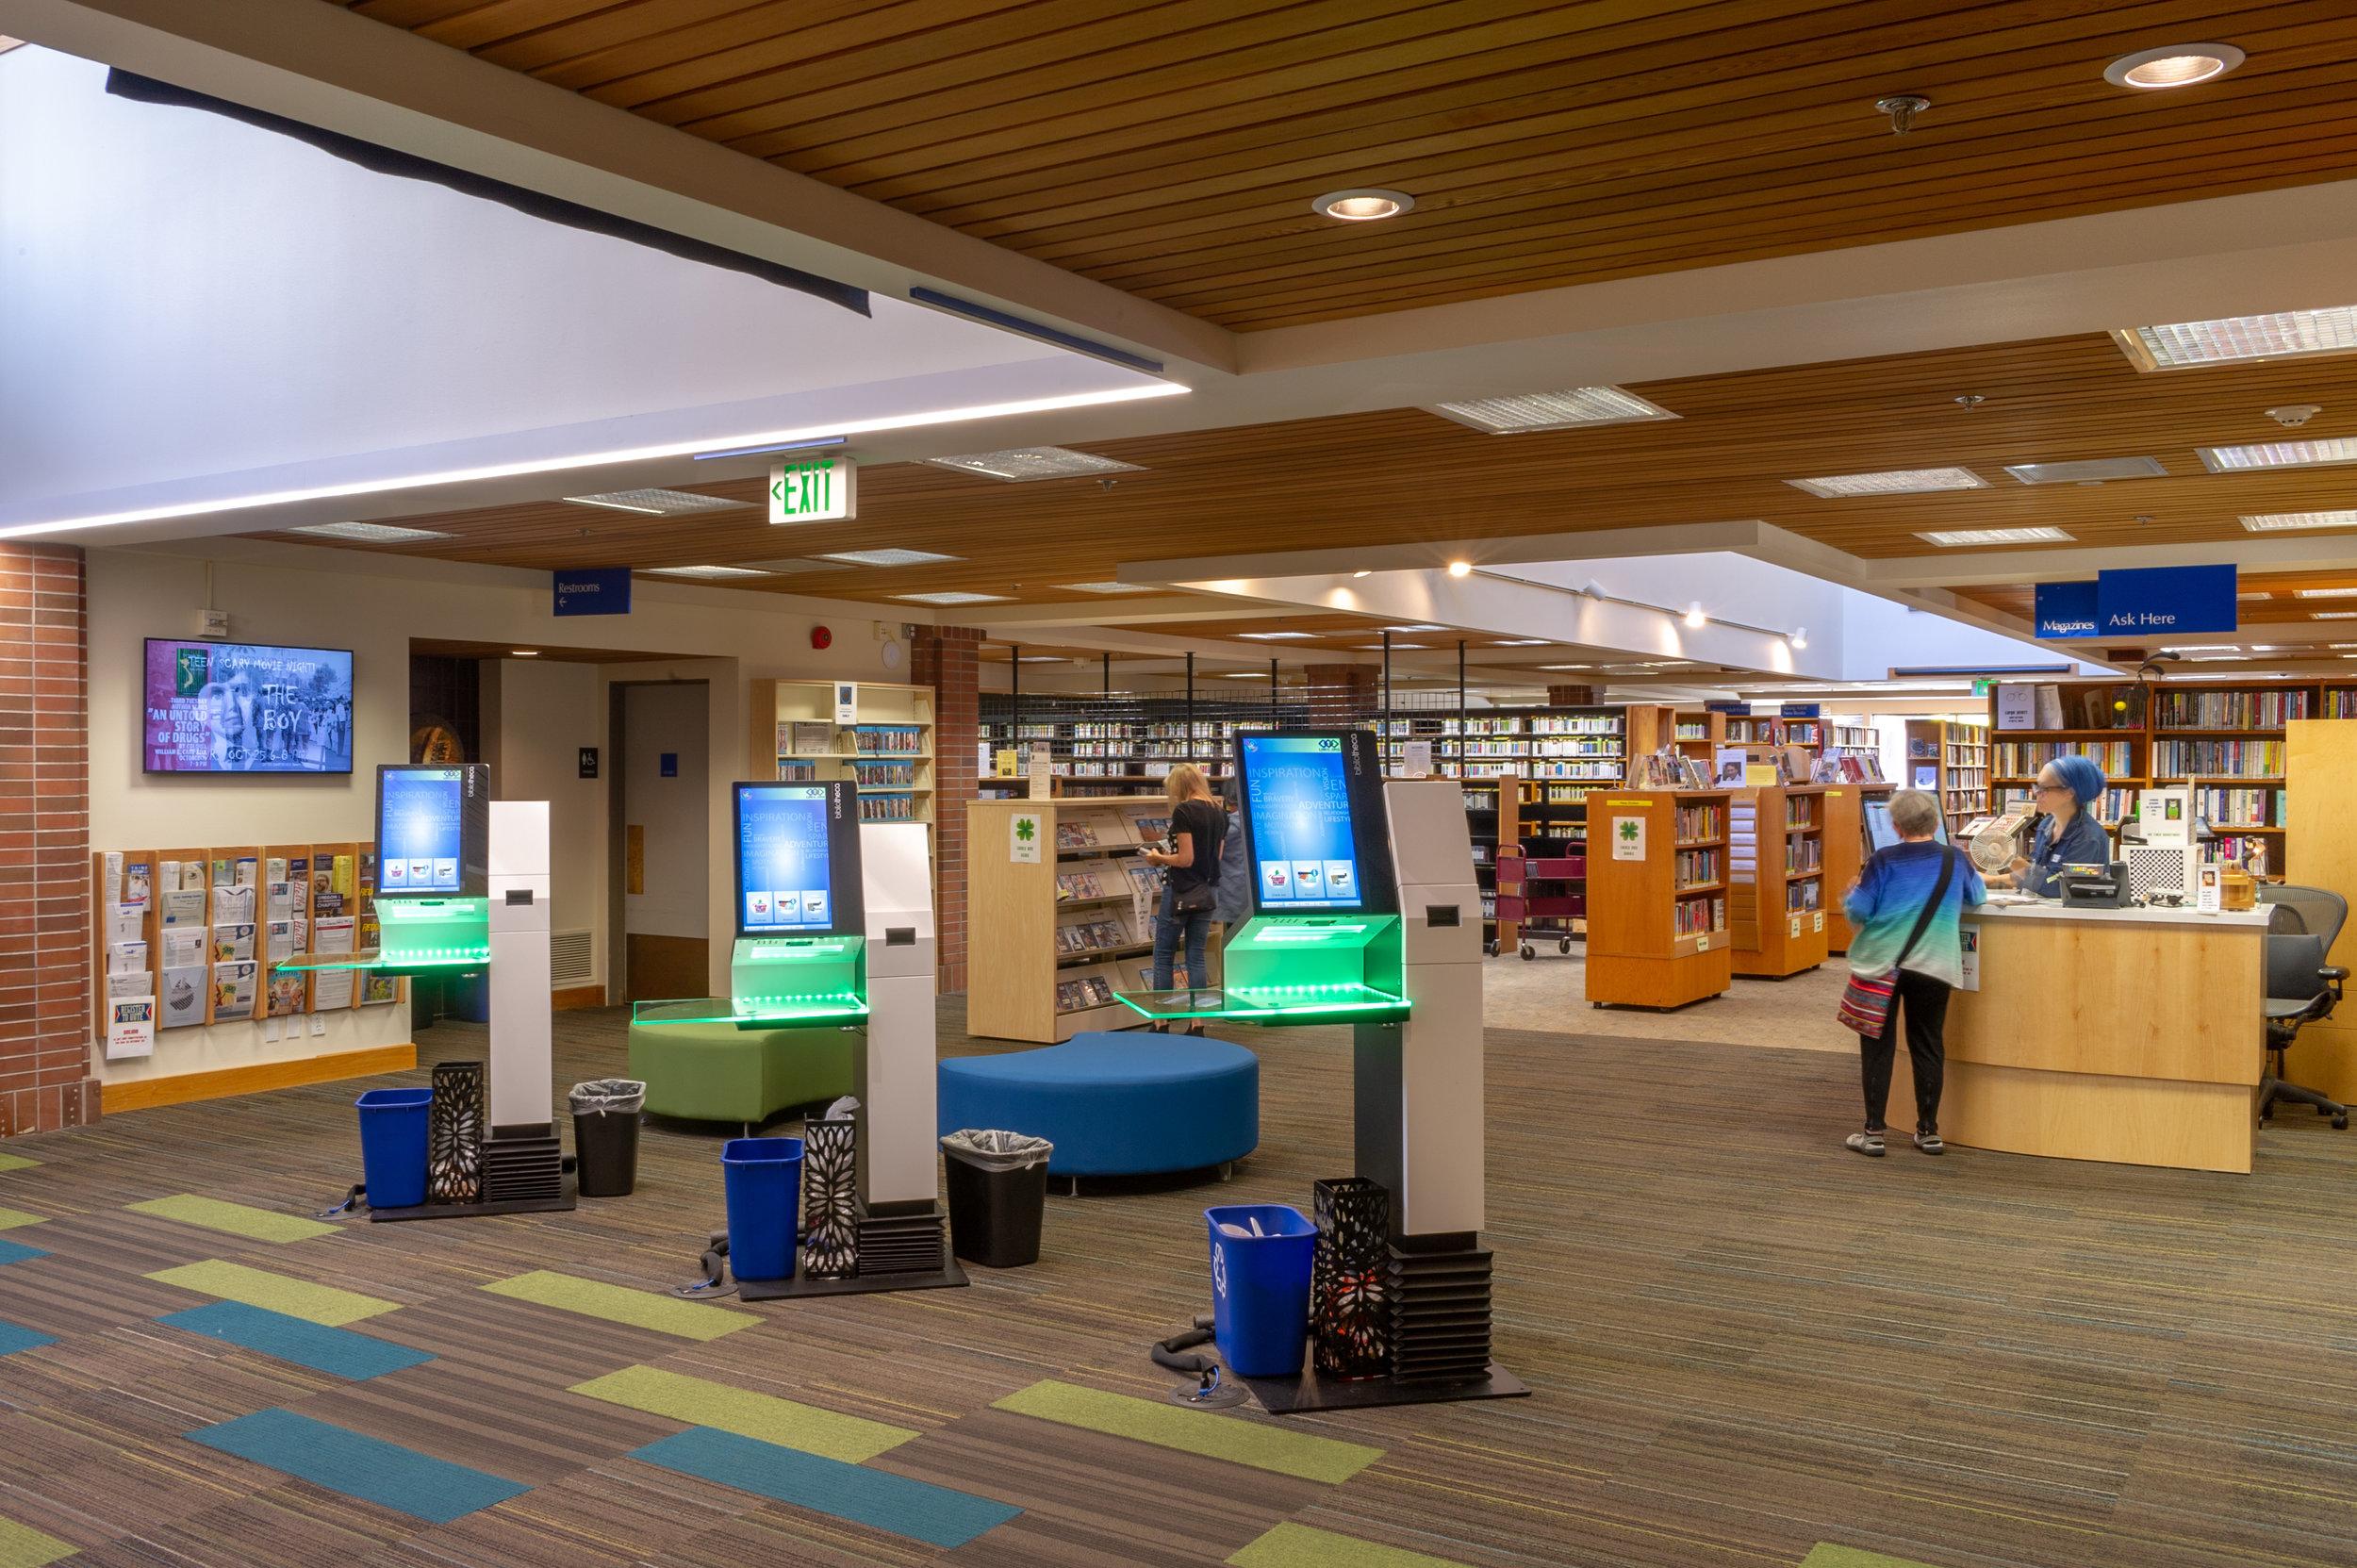 20181015-Lake Oswego Library_35-byDiegoDiaz.jpg